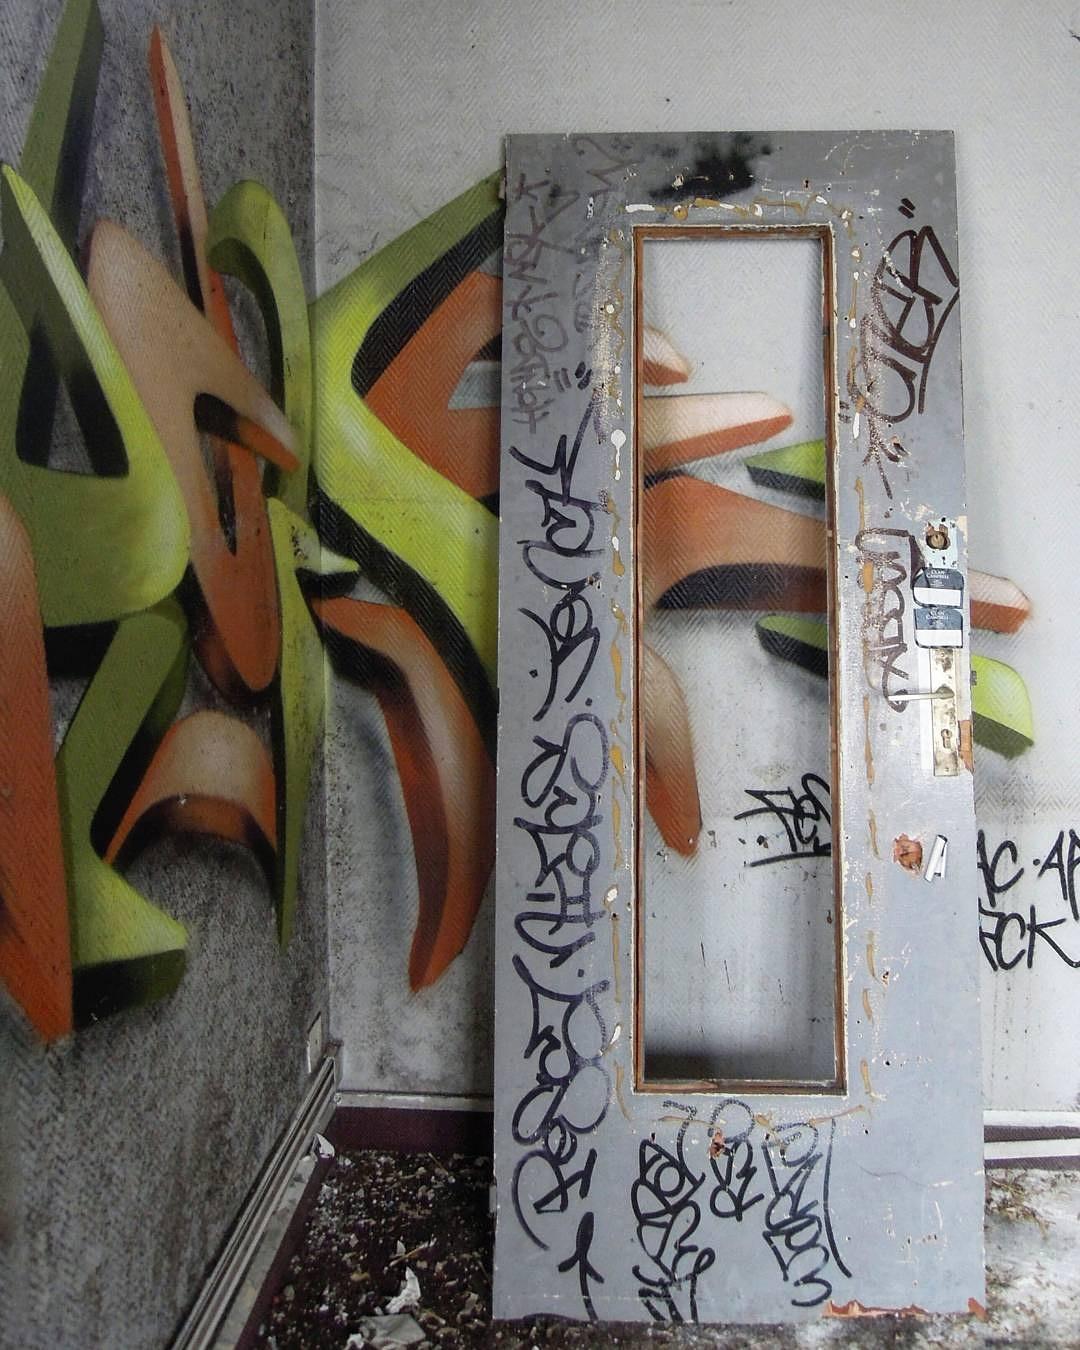 urban exploration, exploration urbaine, urbex, vitry sur seine, abandonned place, insolite, street art graff, graffiti